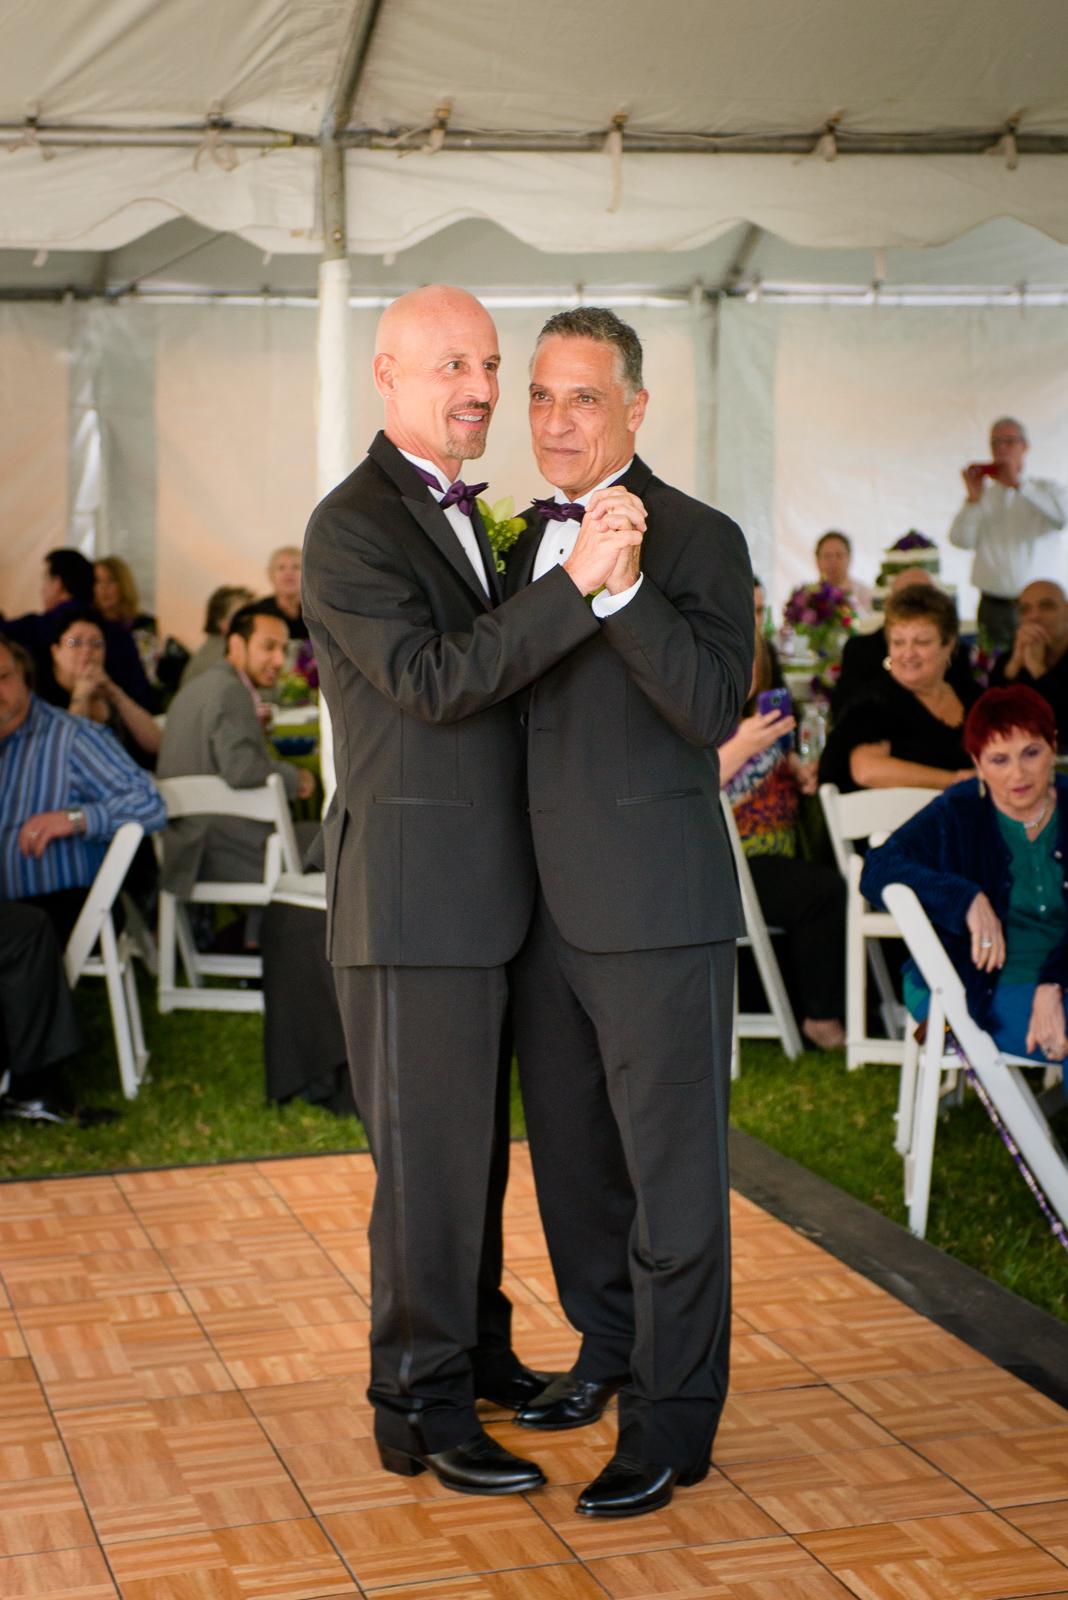 Michael-Napier-Weddings-Ludwig-Guilbeau Wedding-20 (31).jpg